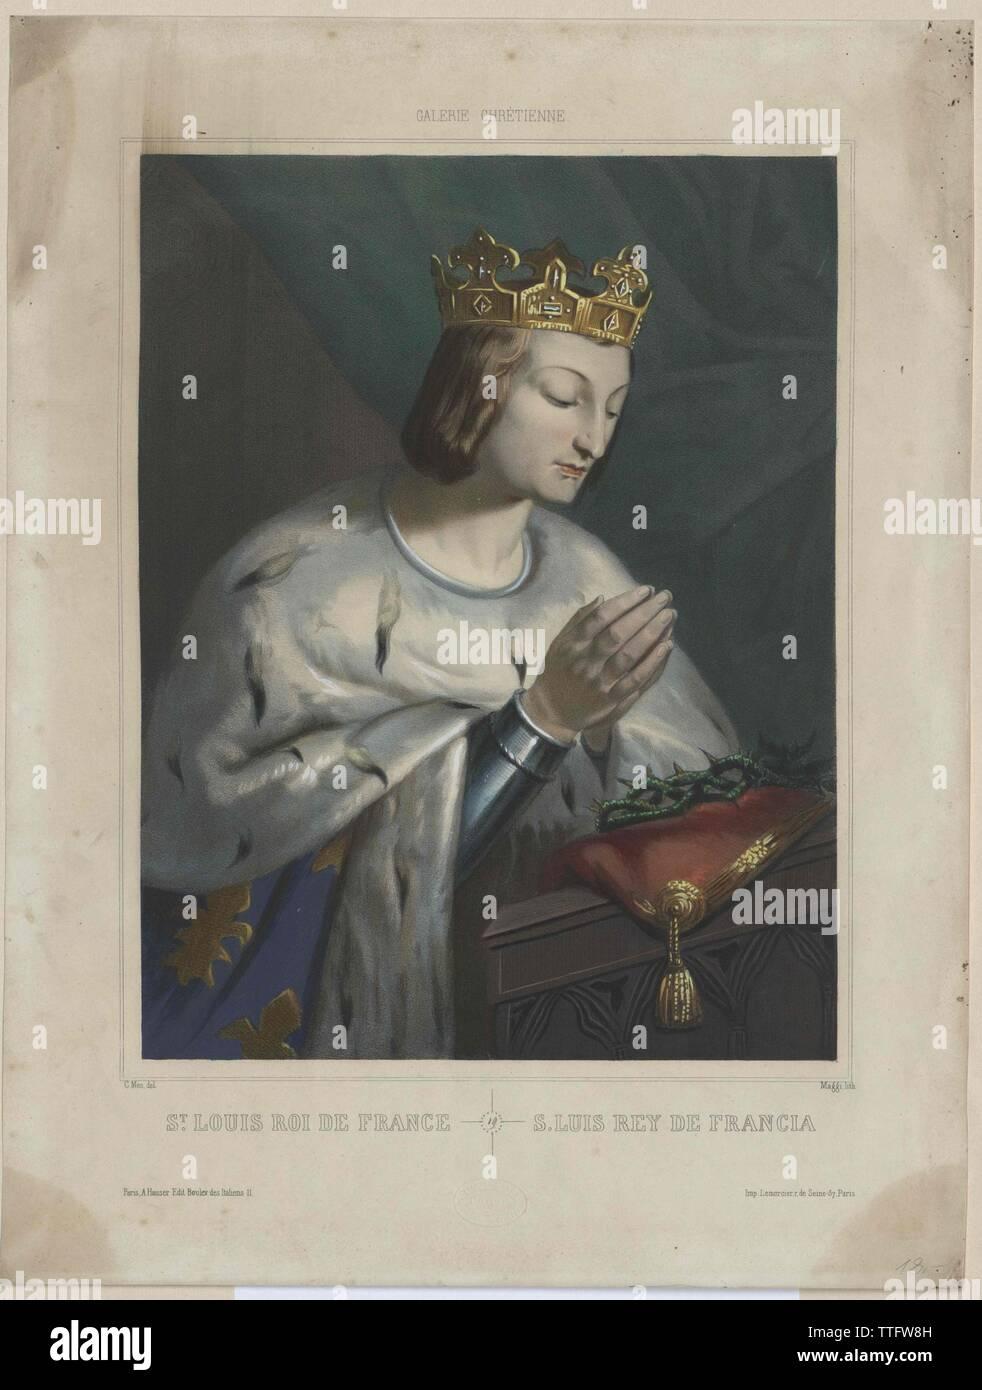 Luis IX, Rey de Francia, santo, Additional-Rights-Clearance-Info-Not-Available Foto de stock